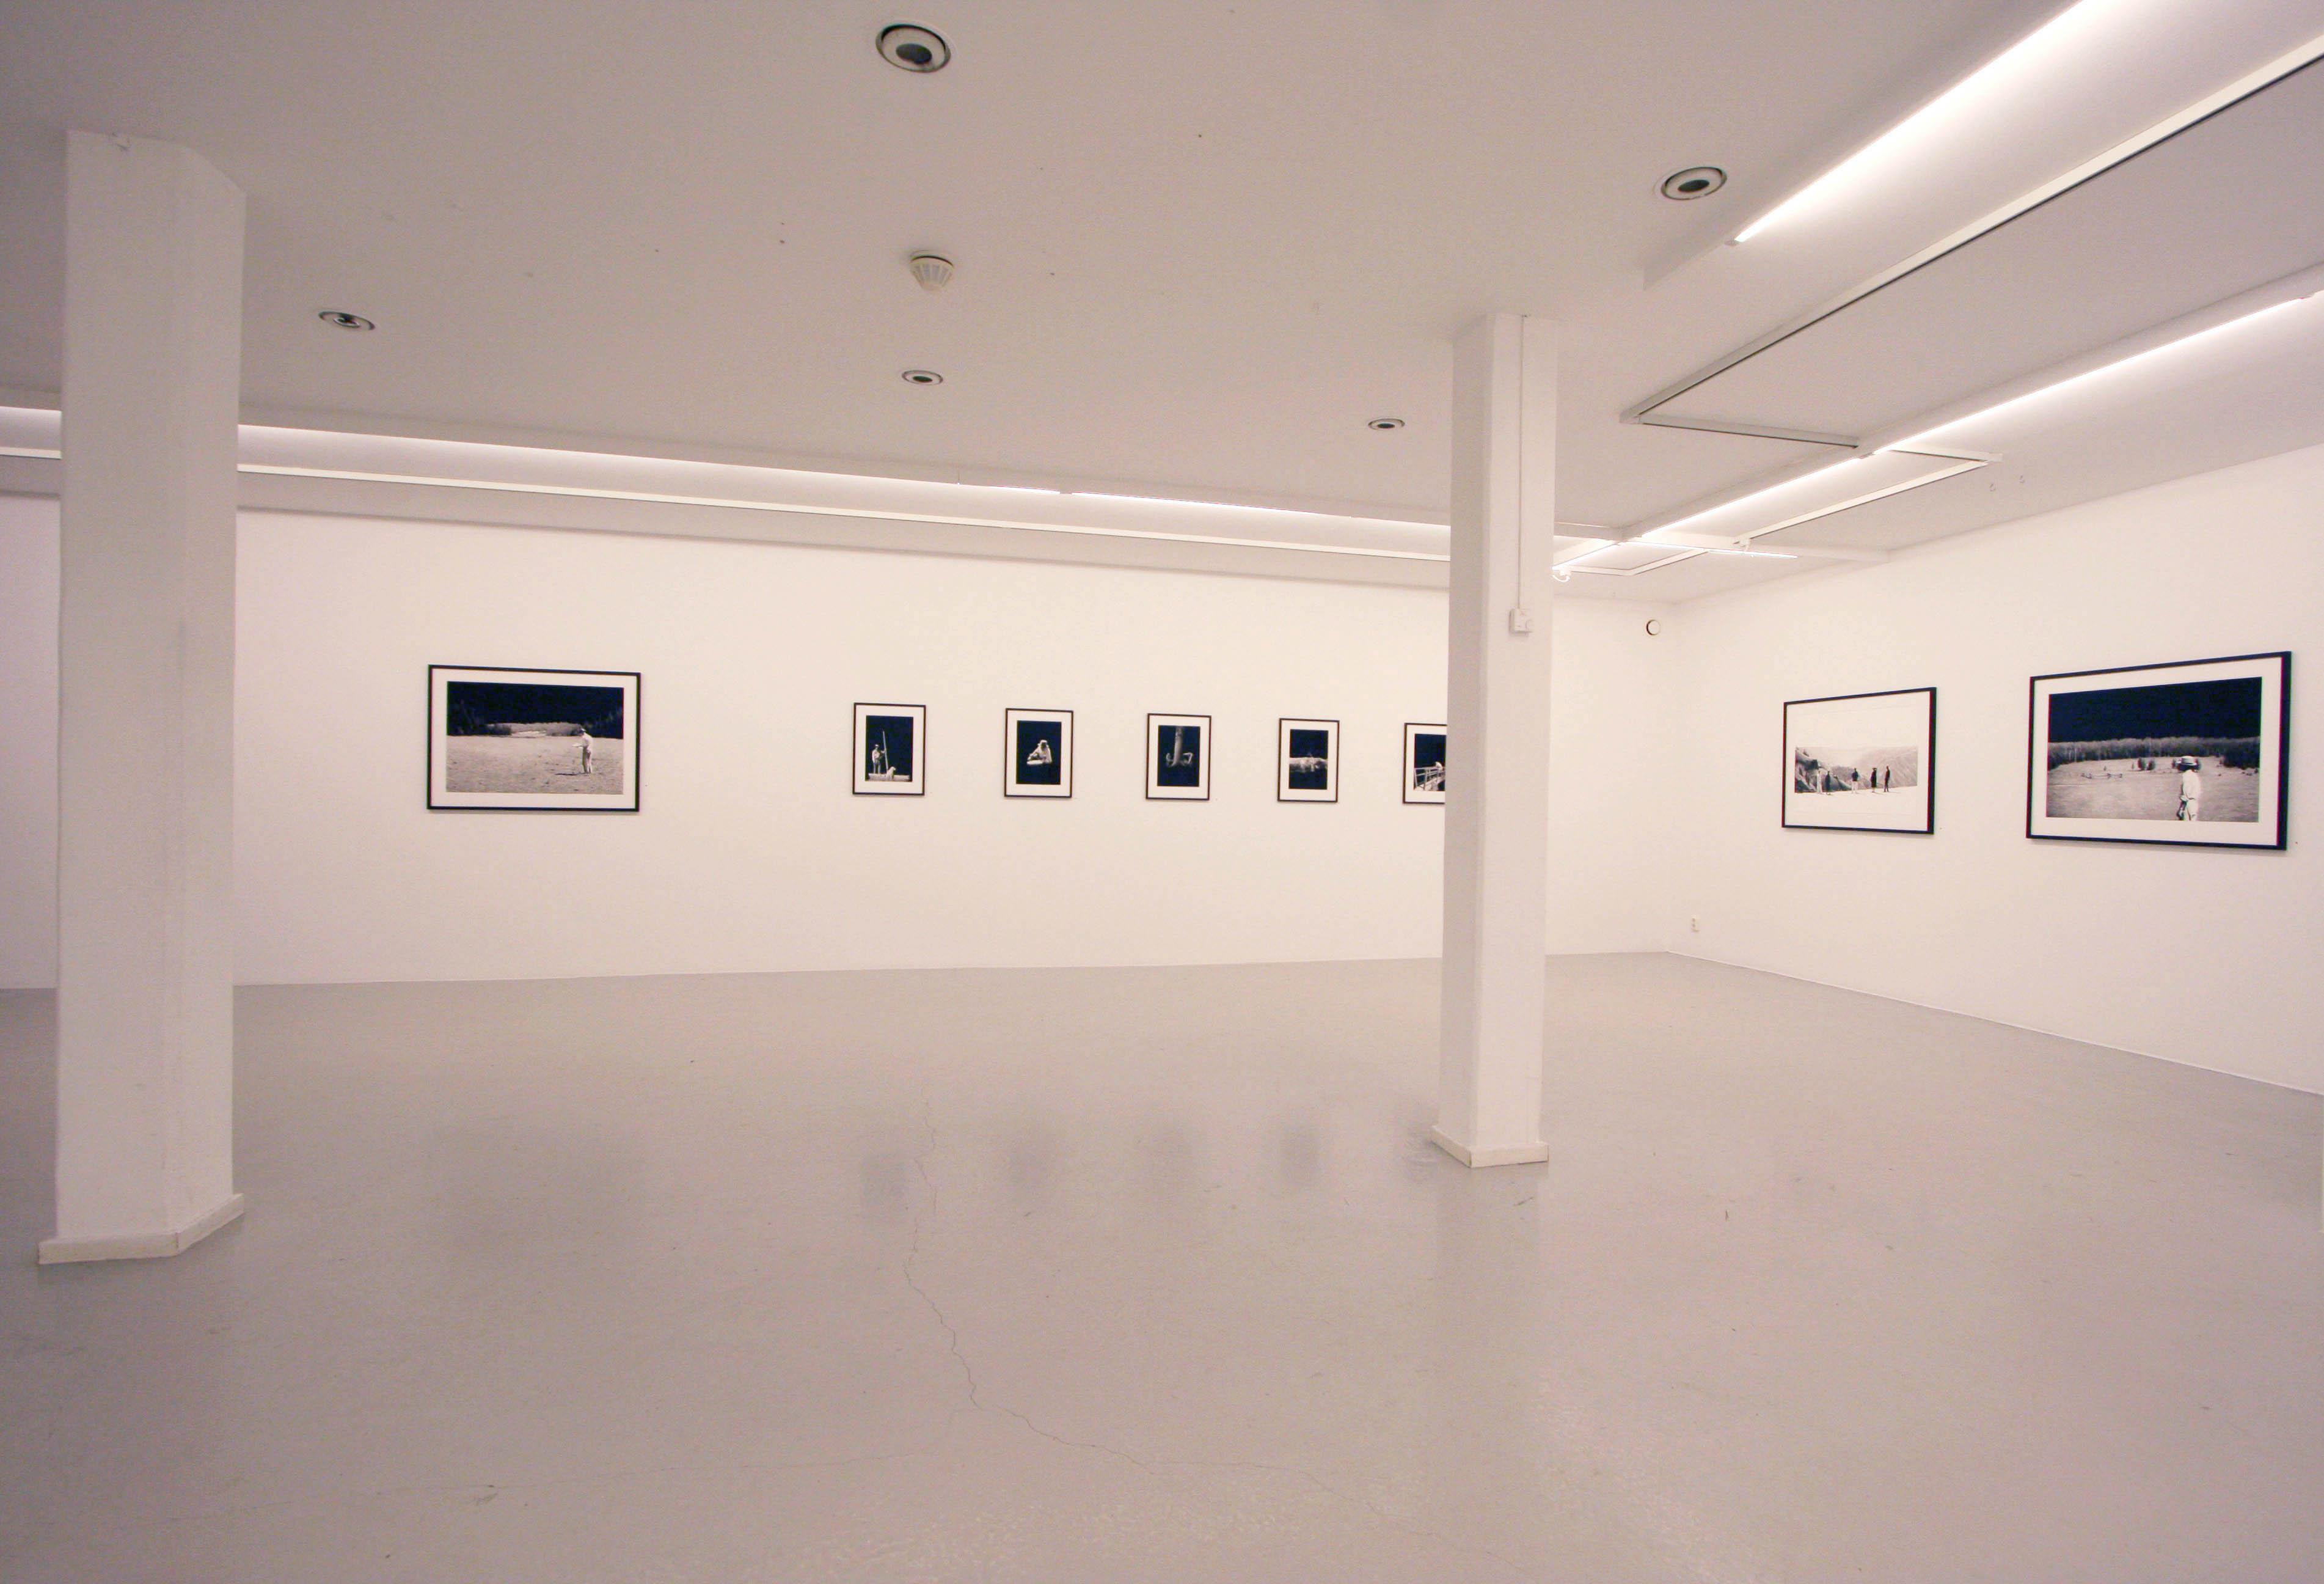 Erik Kihlbaum, Installation view, Circling the Point of Now, at Galleri Thomassen, 2015.